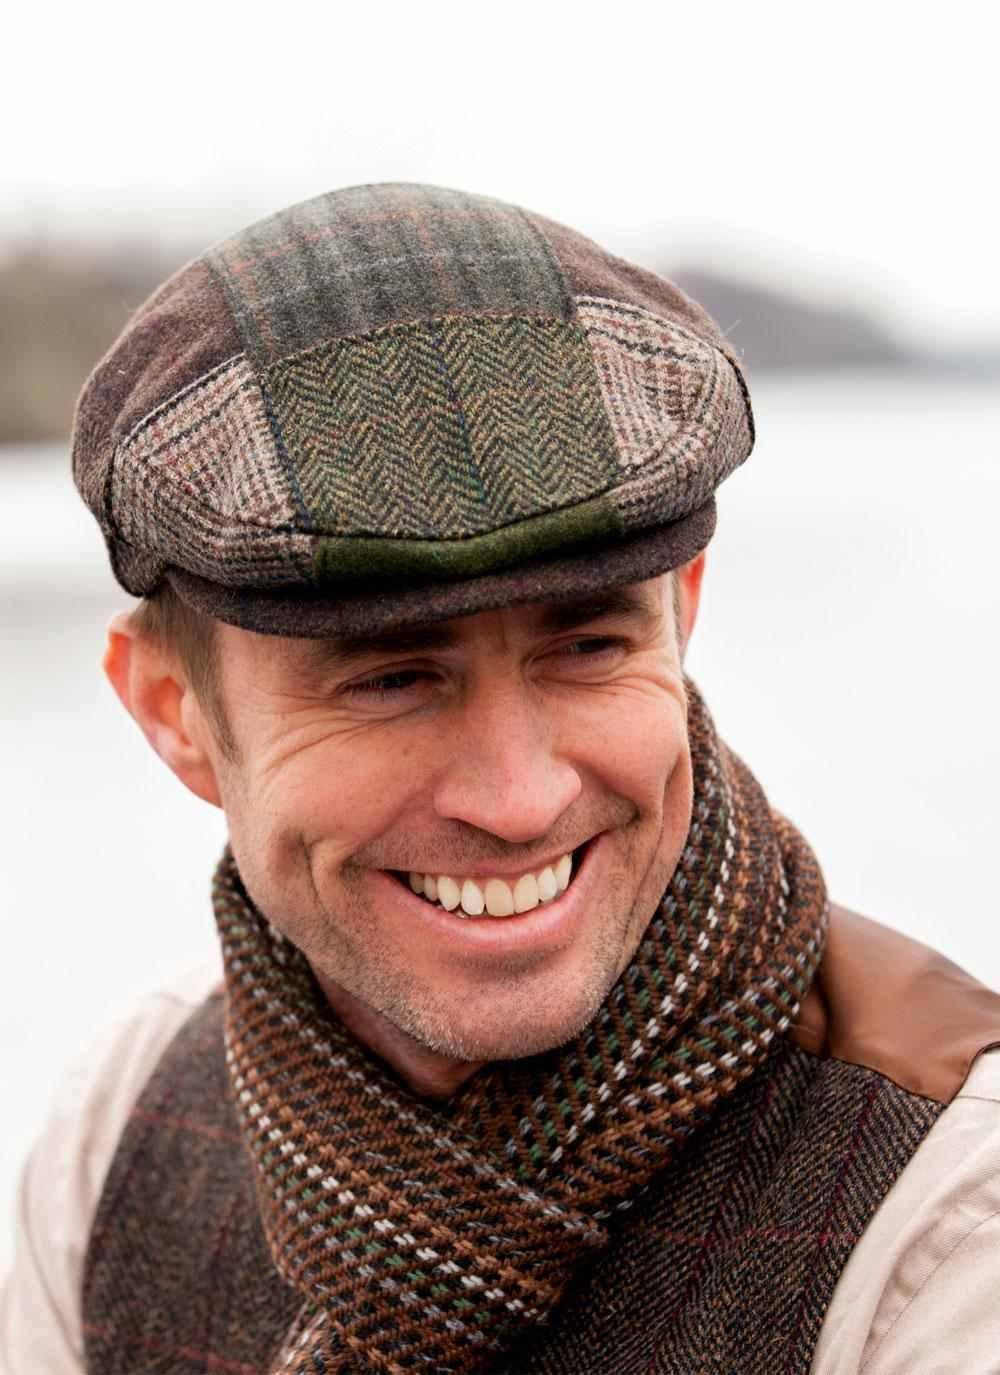 31c8d2fa Mucros Patch cap, alpaca scarf, wool vest - like it all together Blarney.com